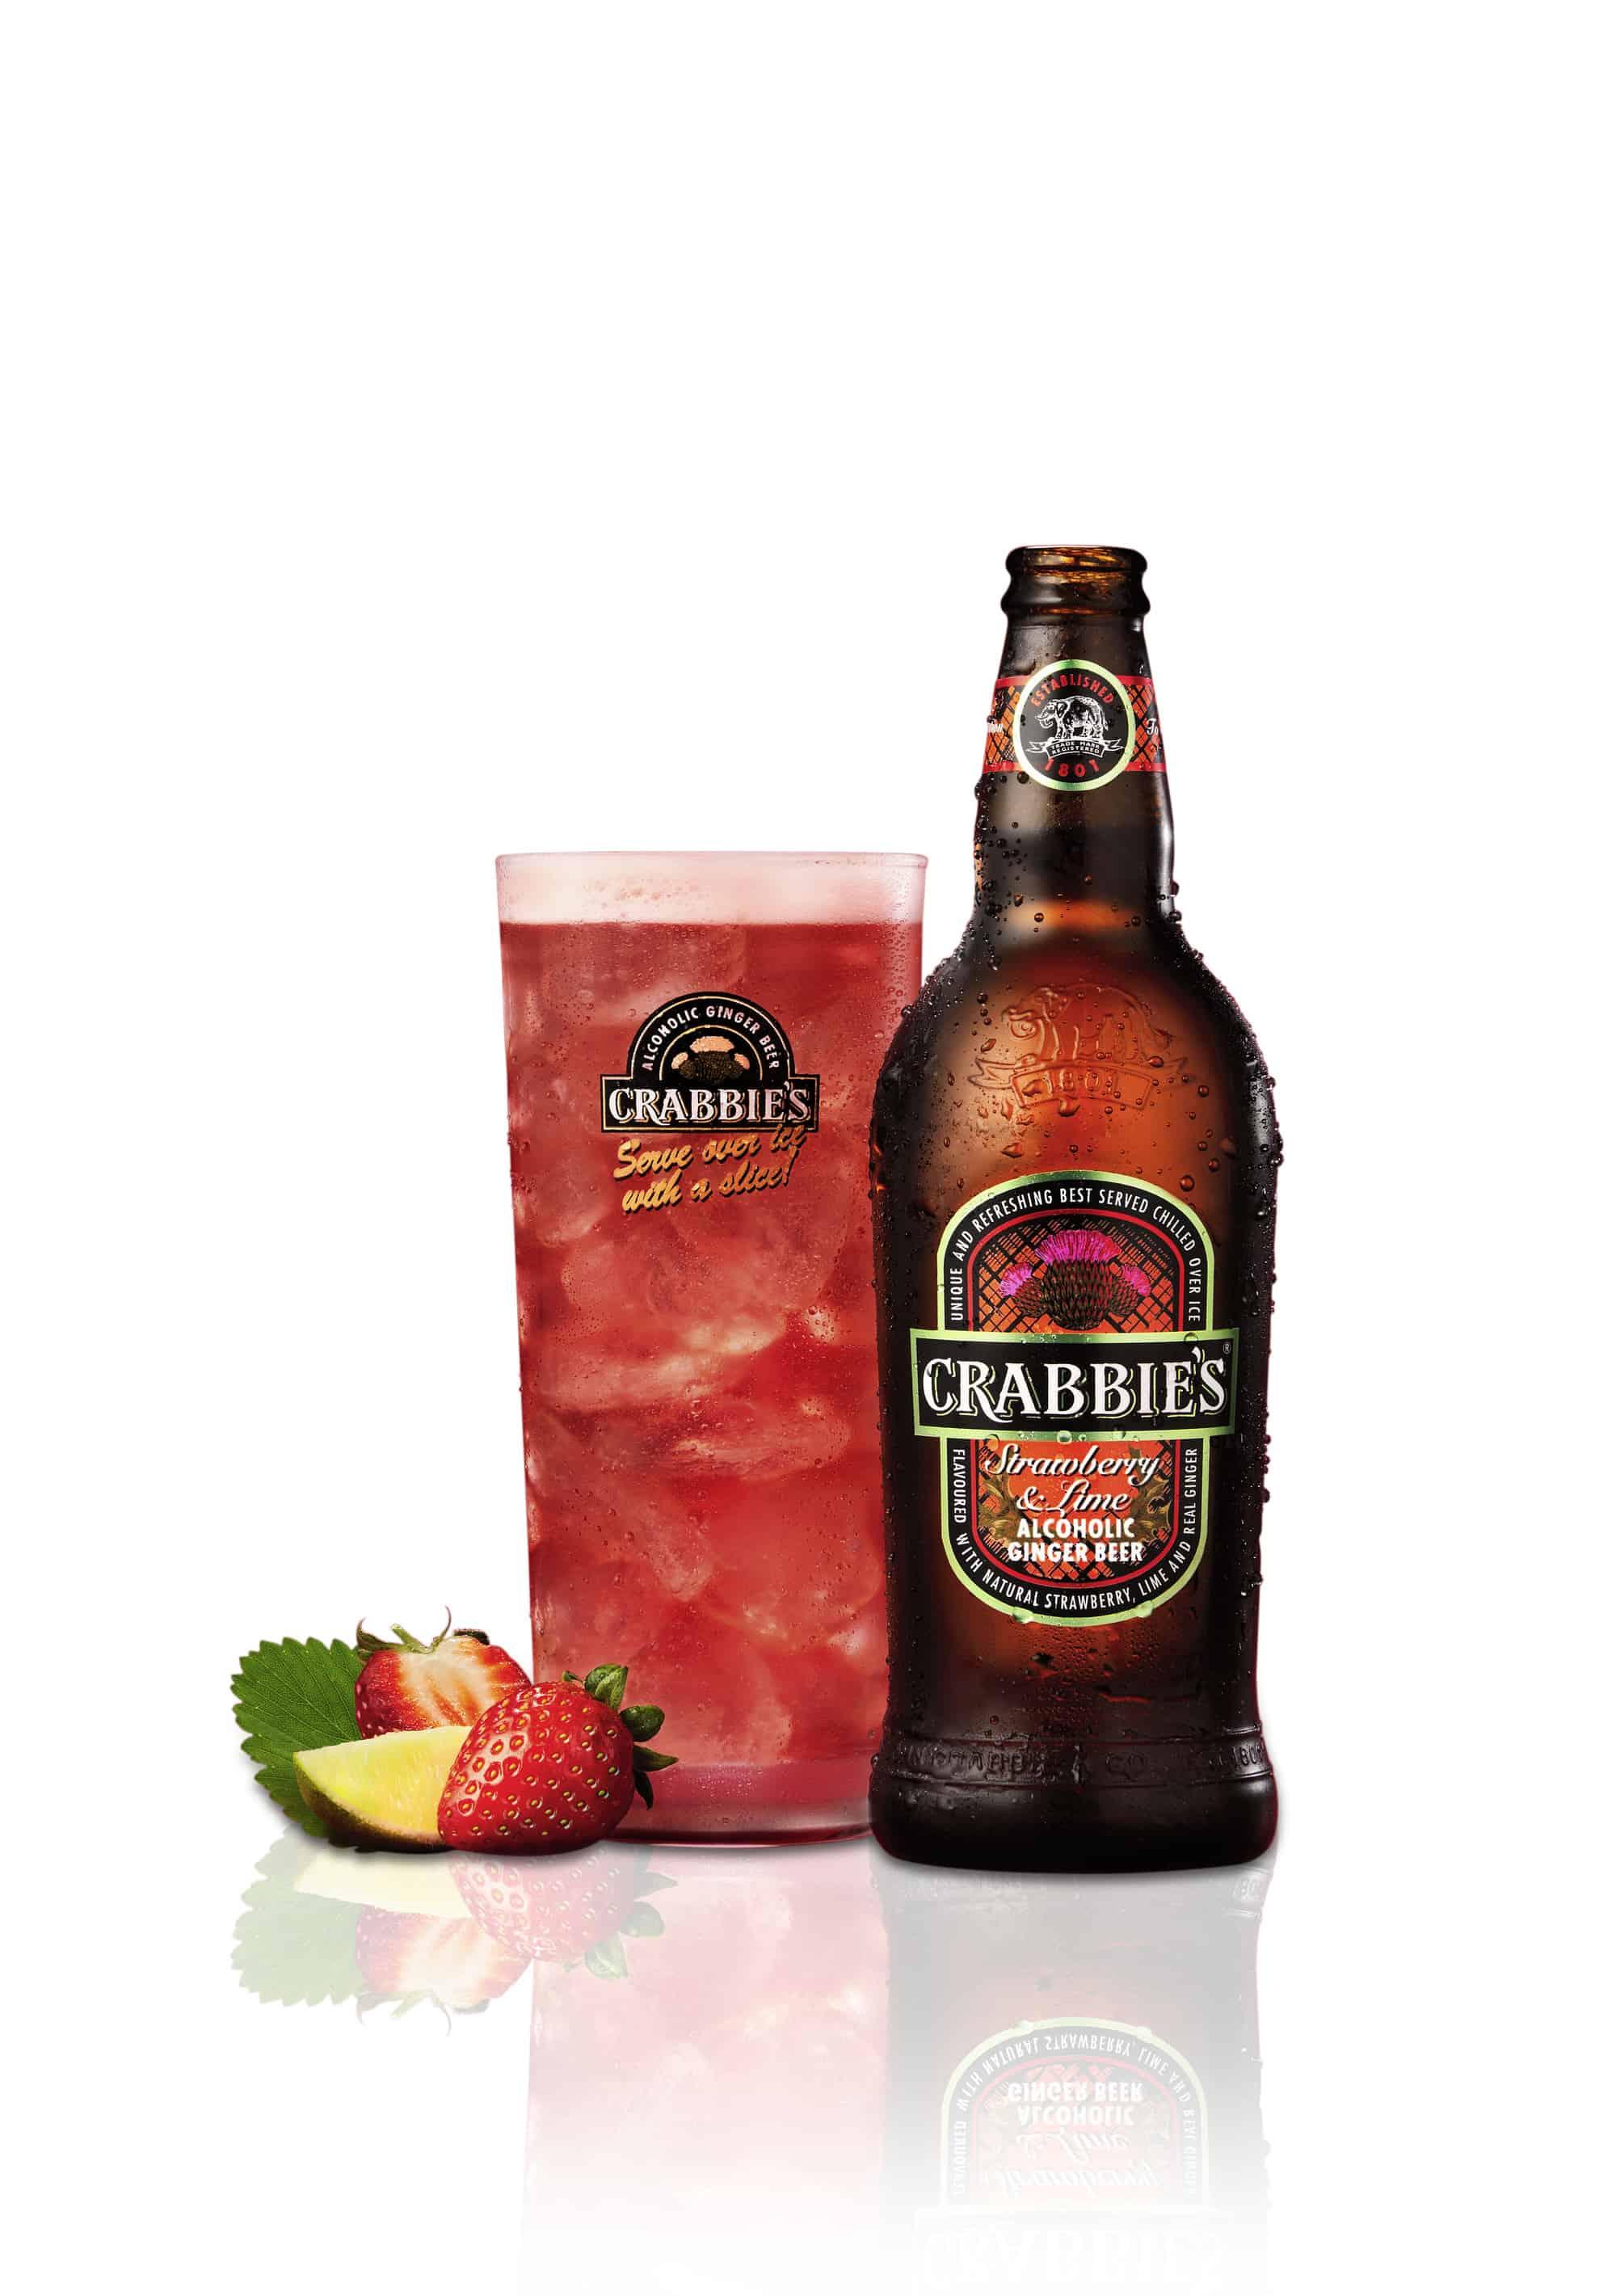 Crabbies Strawberry pr shot